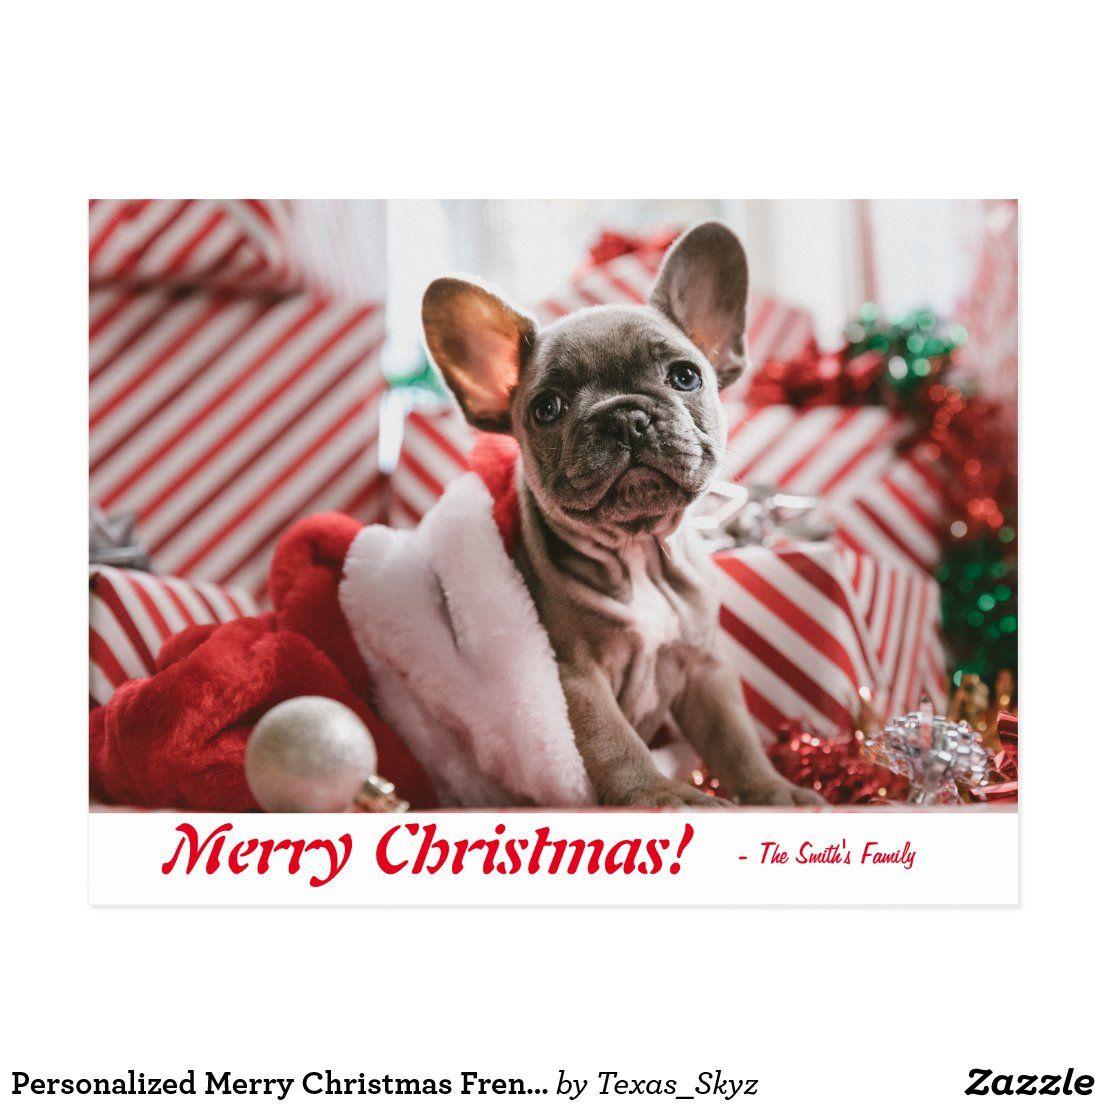 Personalized Merry Christmas French Bulldog Puppy Postcard | Zazzle.com